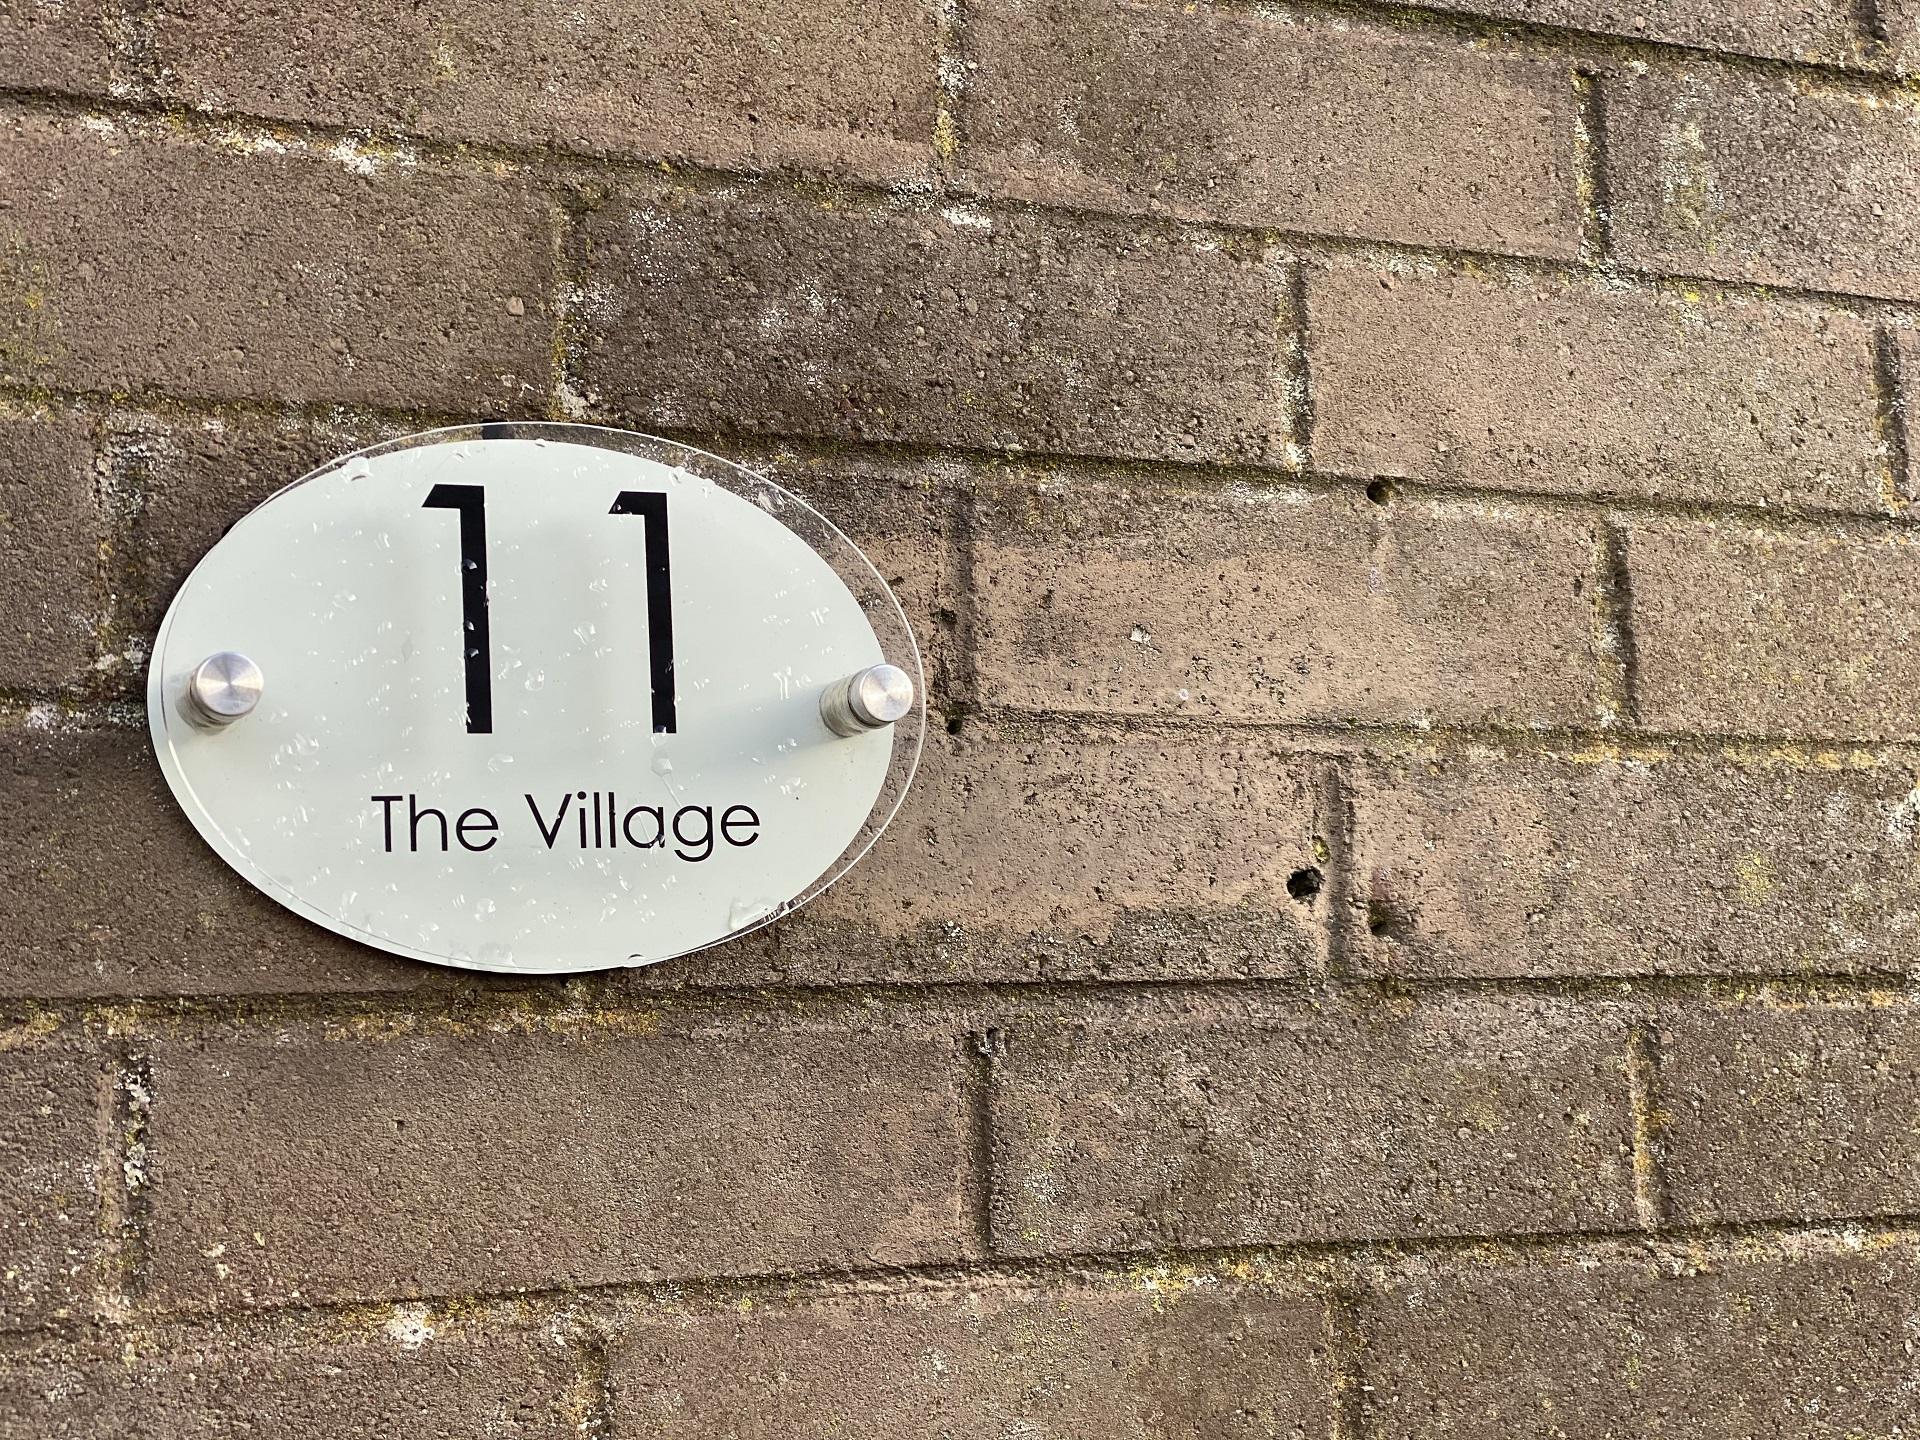 The Village, Rosemount  Cityside  BT48